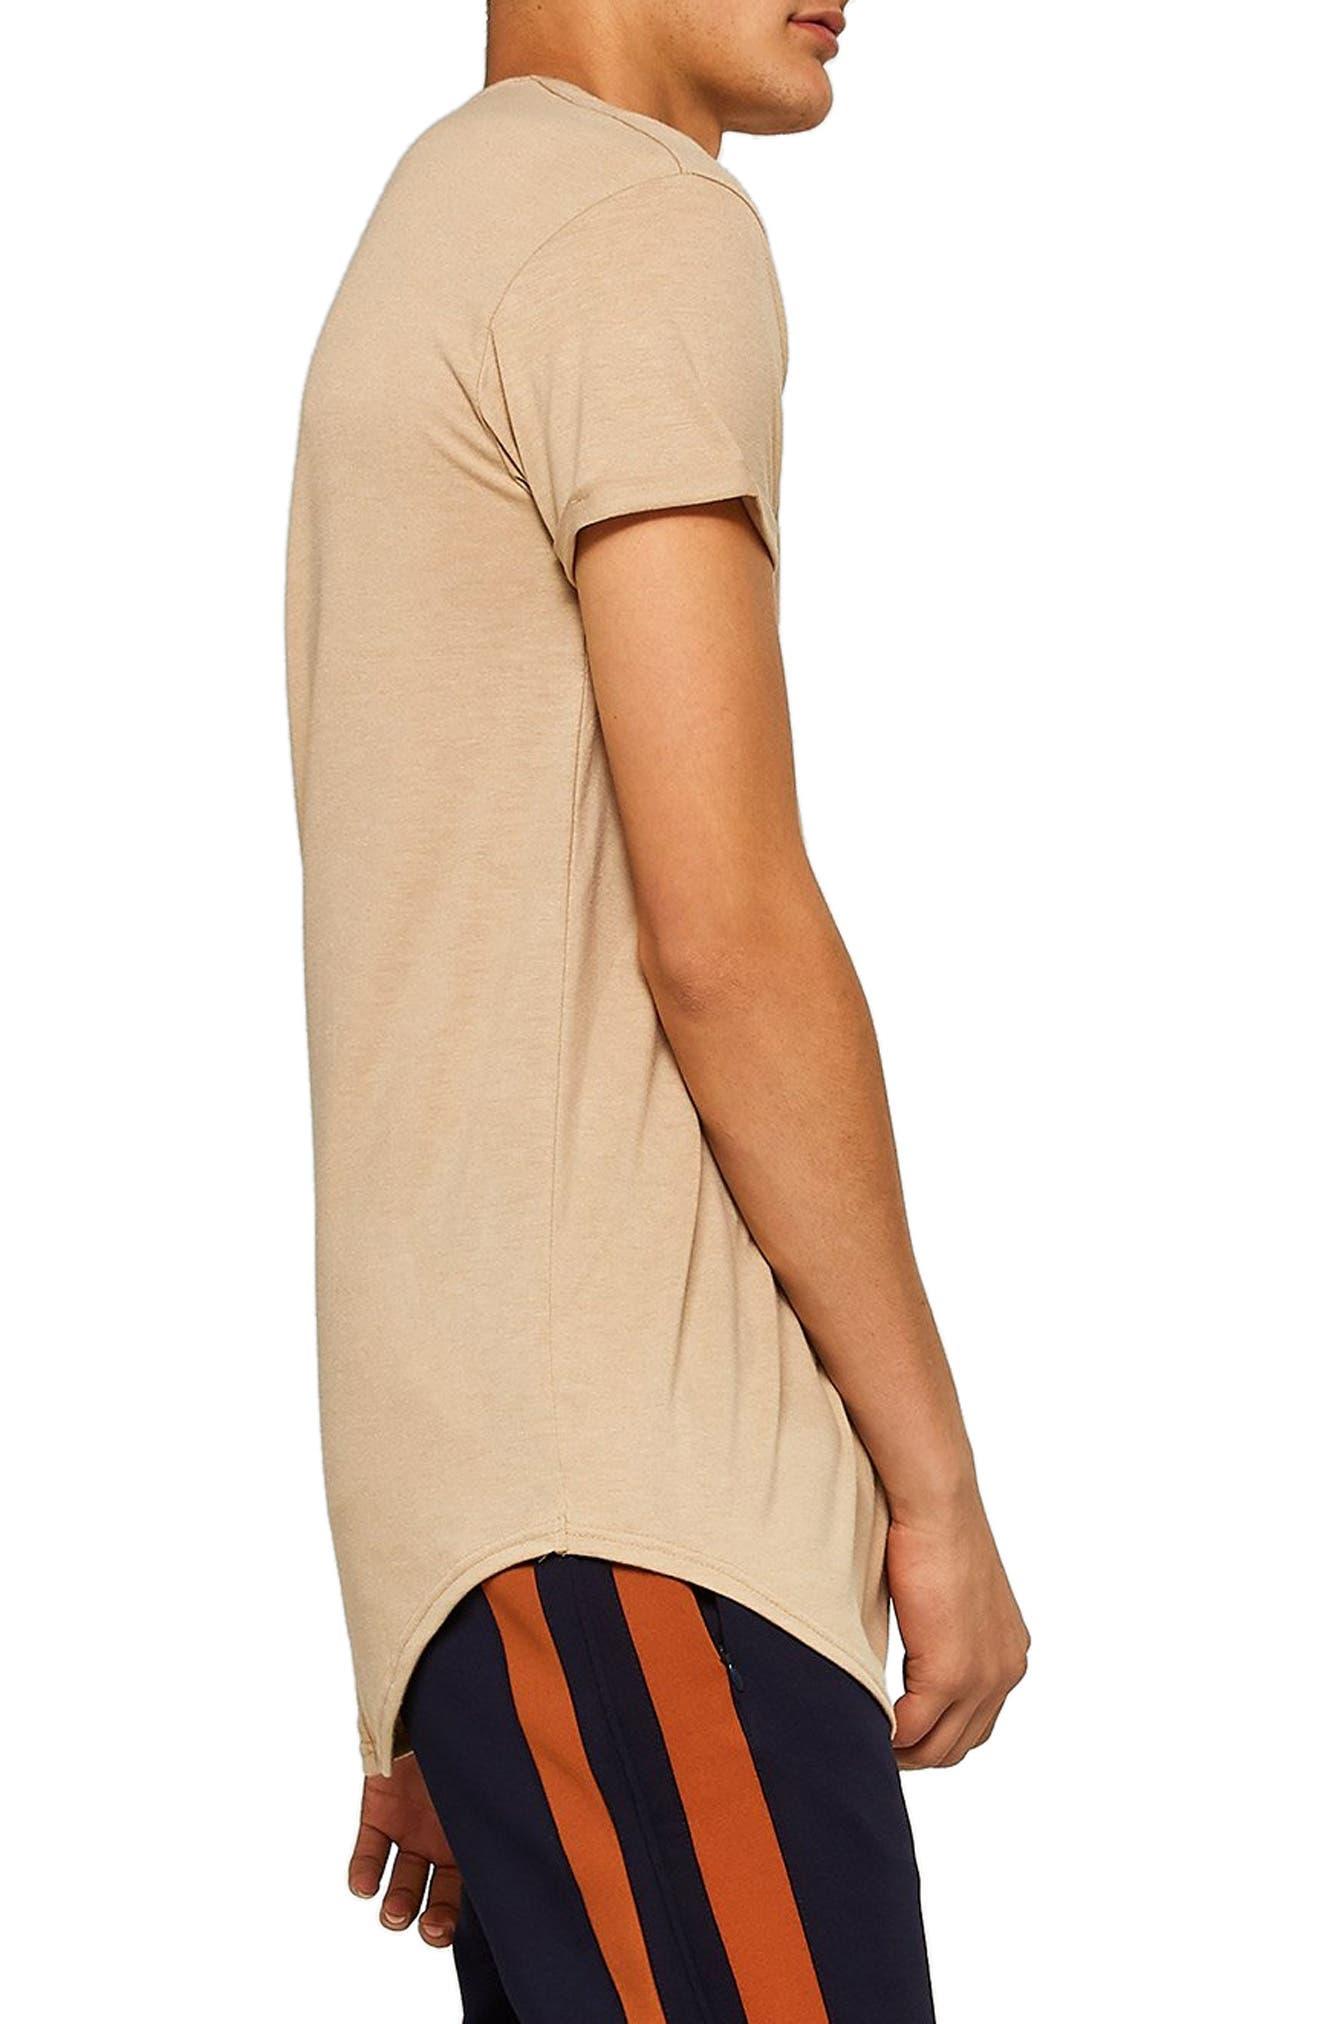 TOPMAN, Scotty Longline T-Shirt, Alternate thumbnail 3, color, STONE